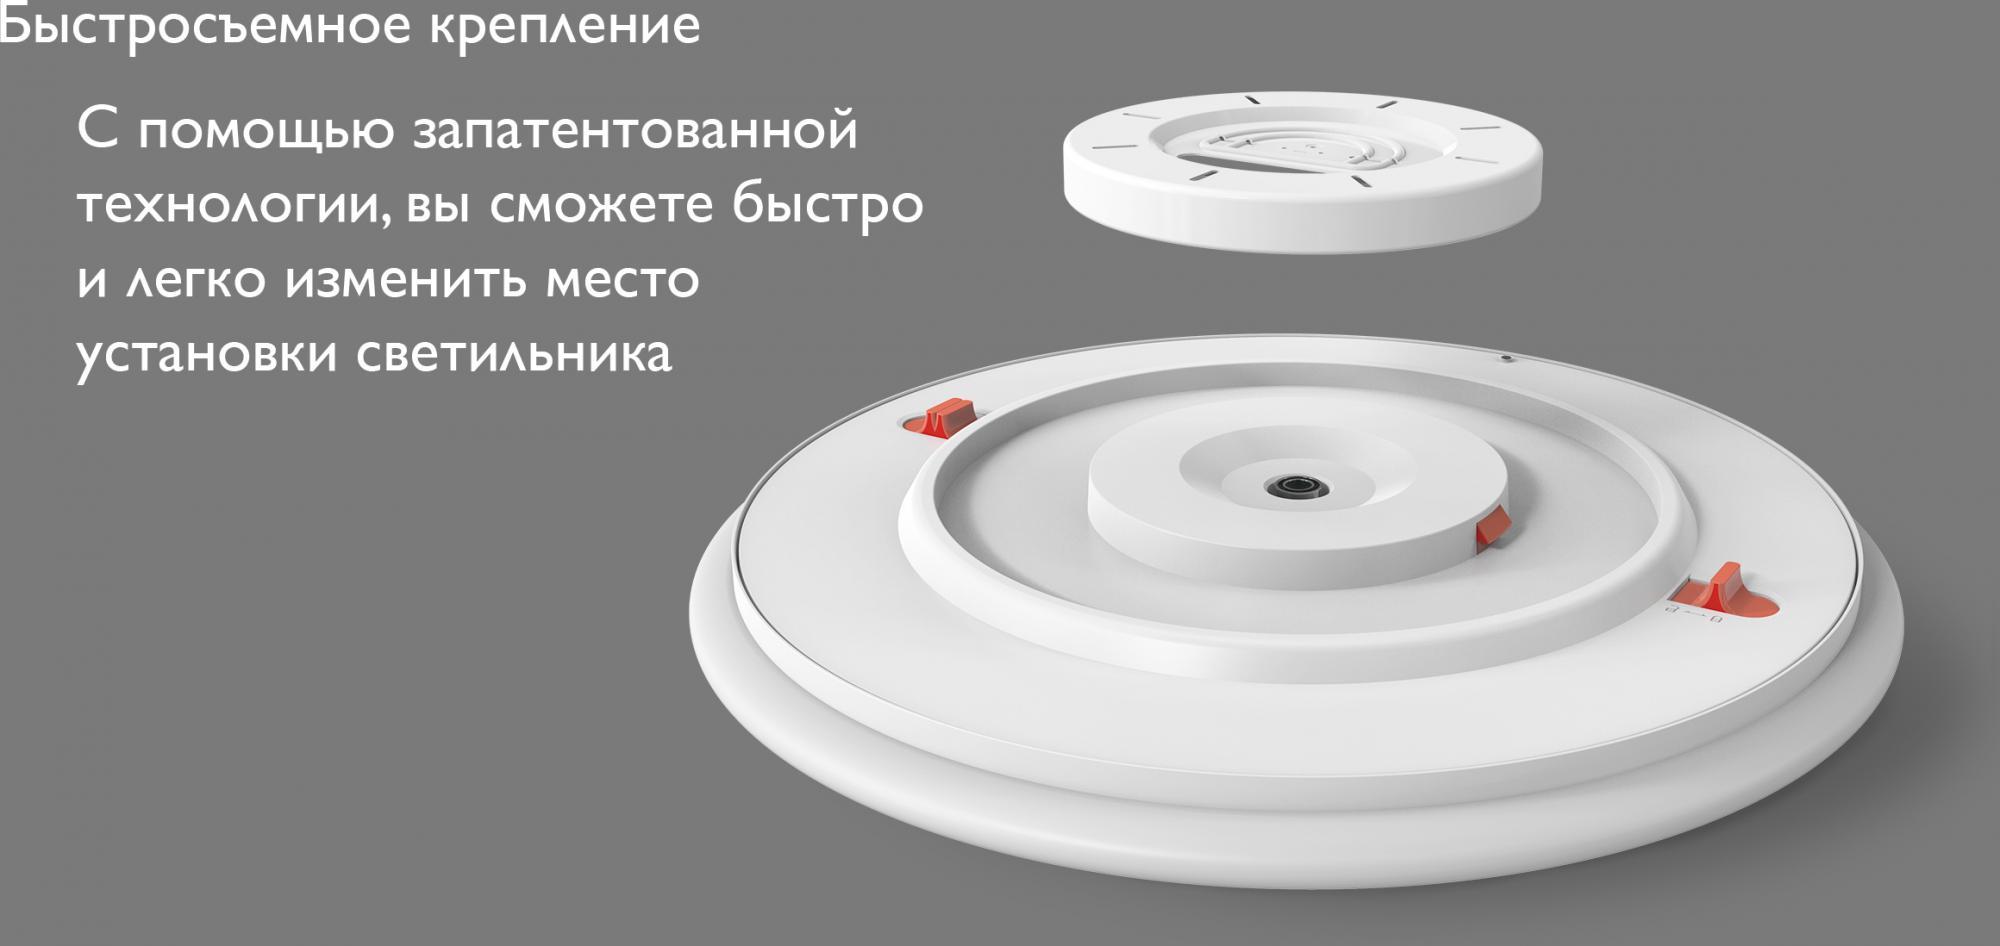 Потолочная лампа Xiaomi Yeelight Arwen Ceiling Light 450C (White) YLXD013-B robot4home.ru